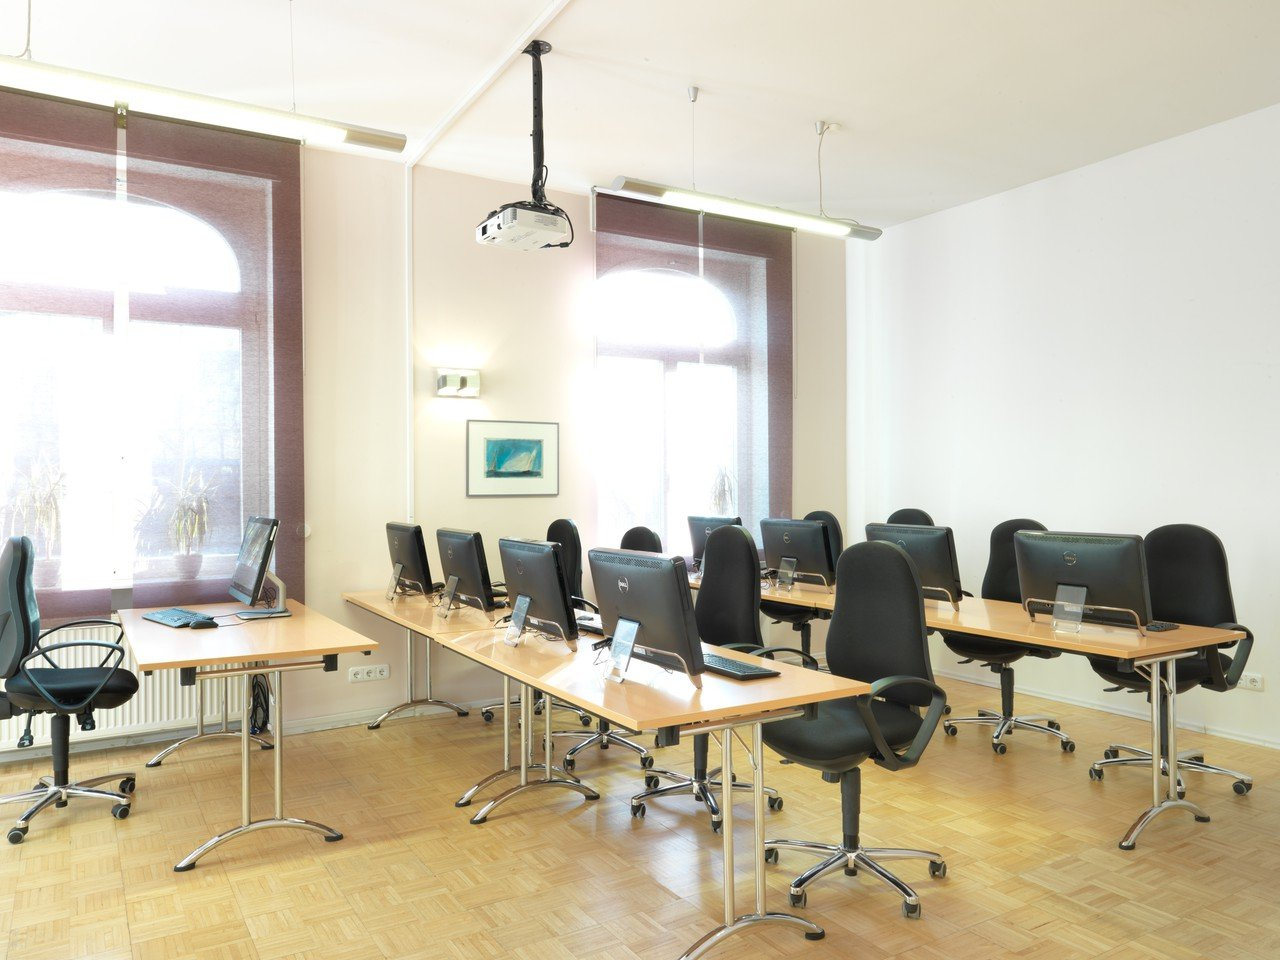 Frankfurt am Main training rooms Meetingraum Großer Schulungsraum 36 m² image 0